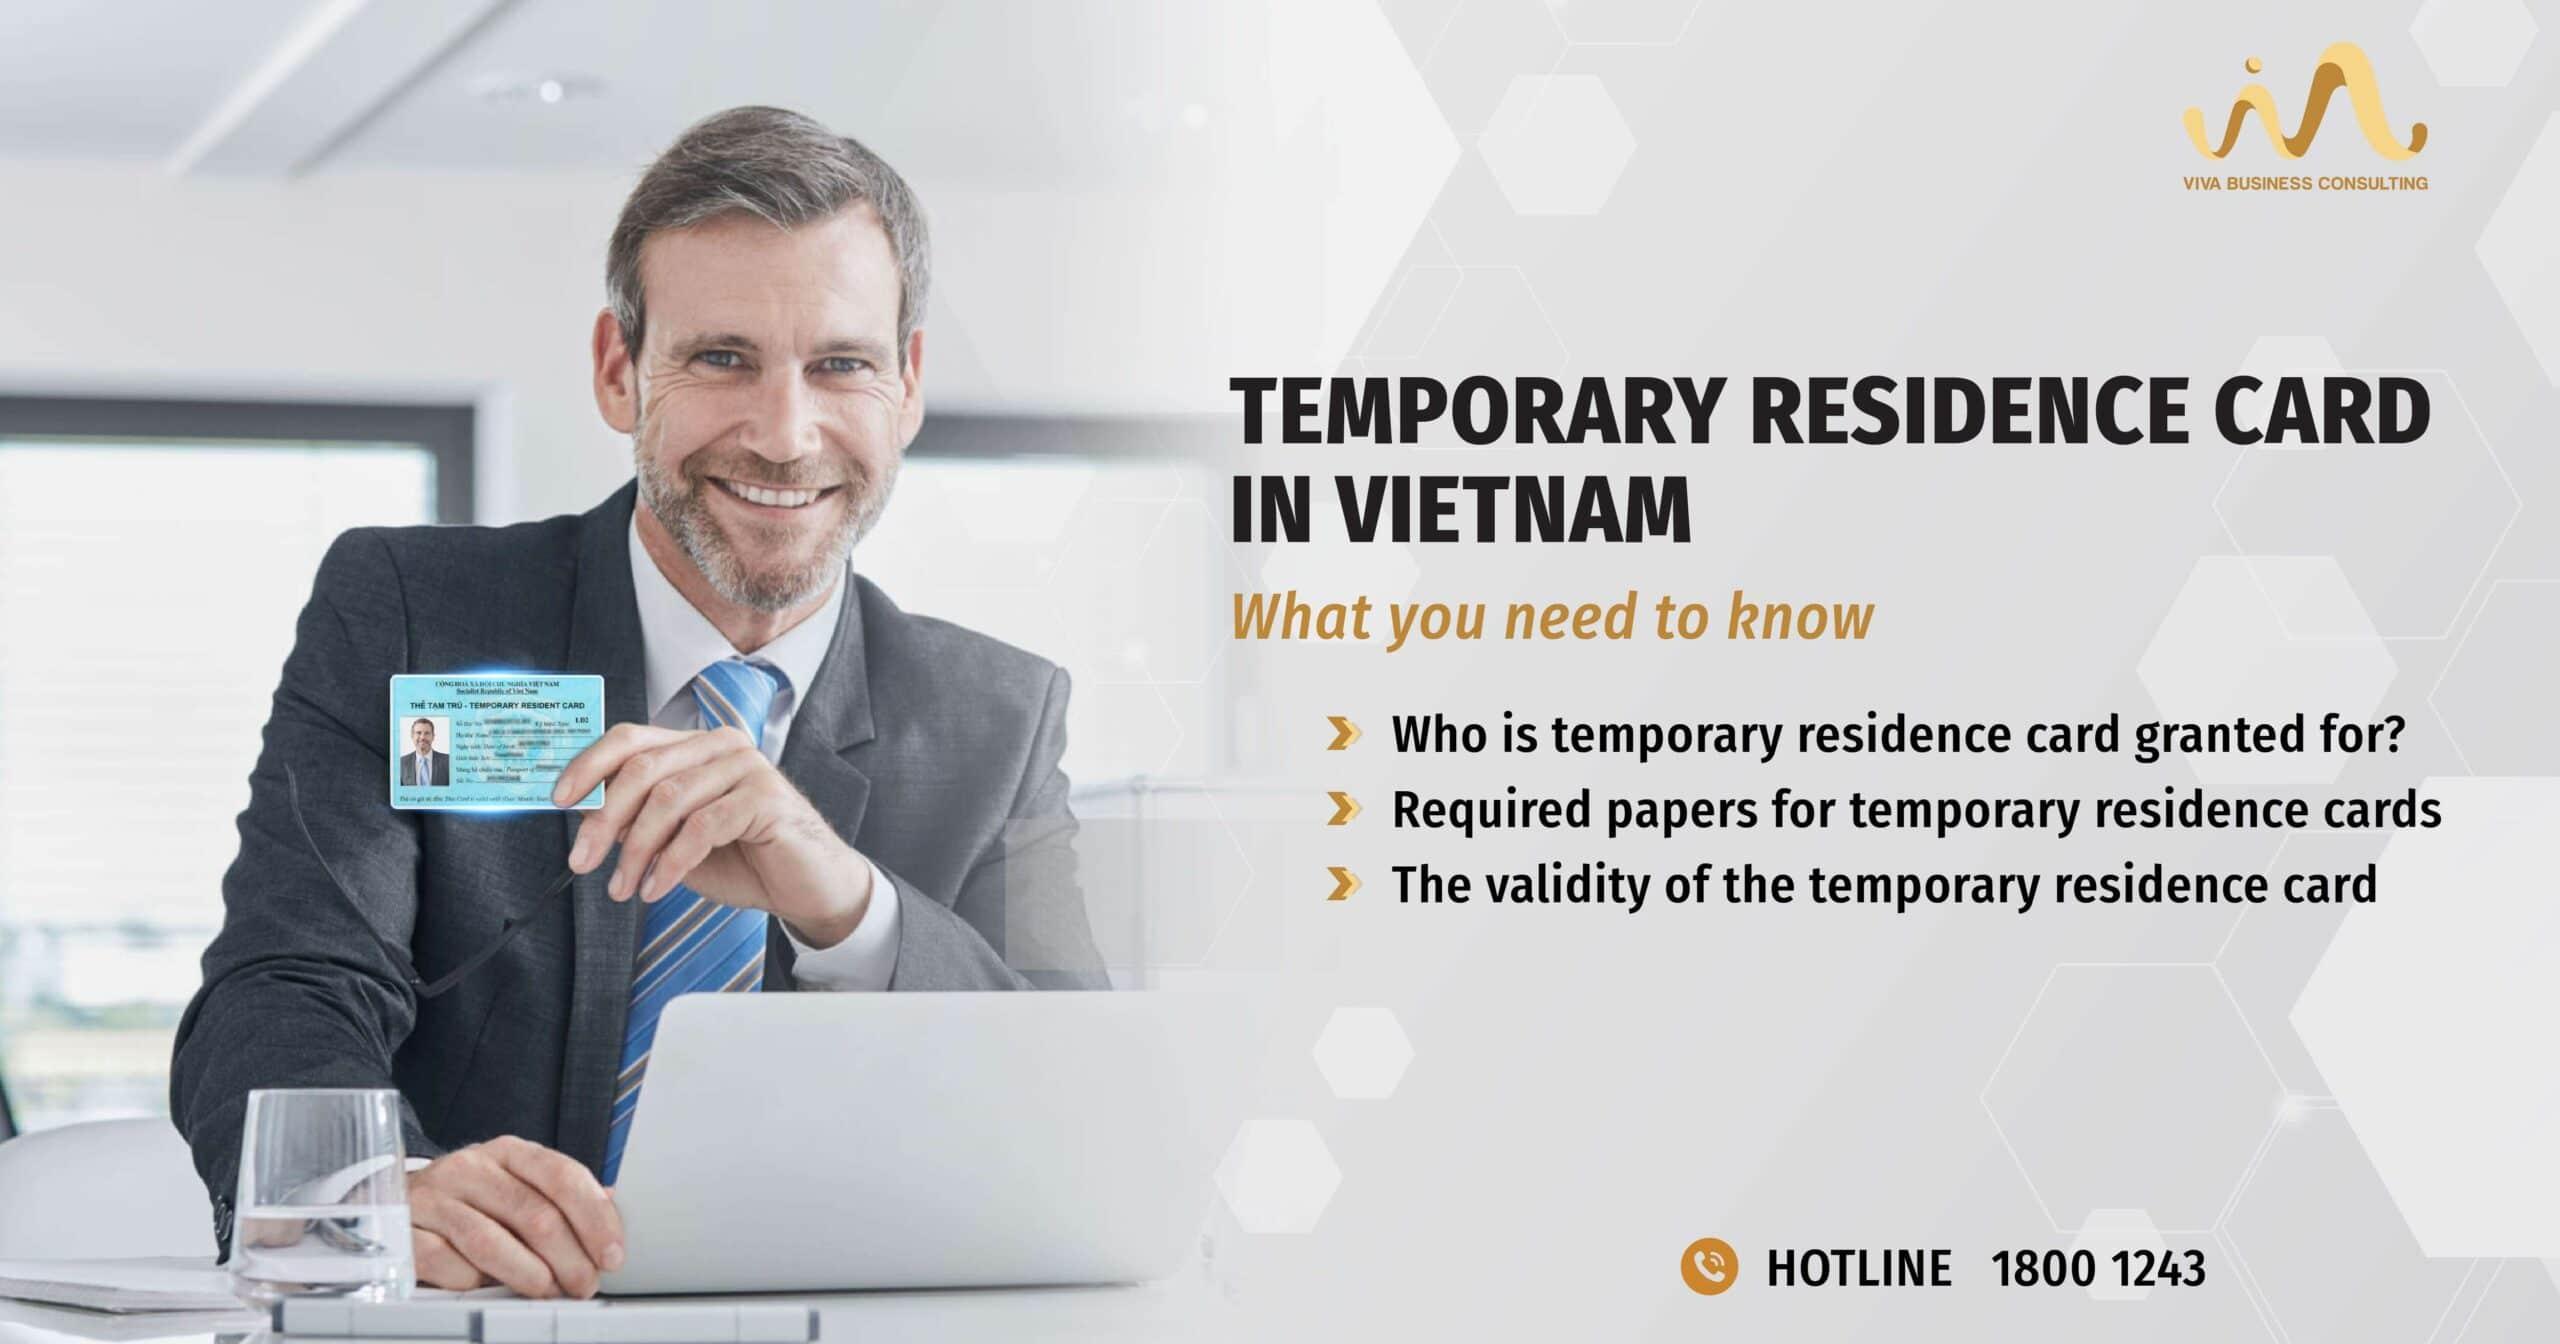 Temporary Residence Card in Vietnam